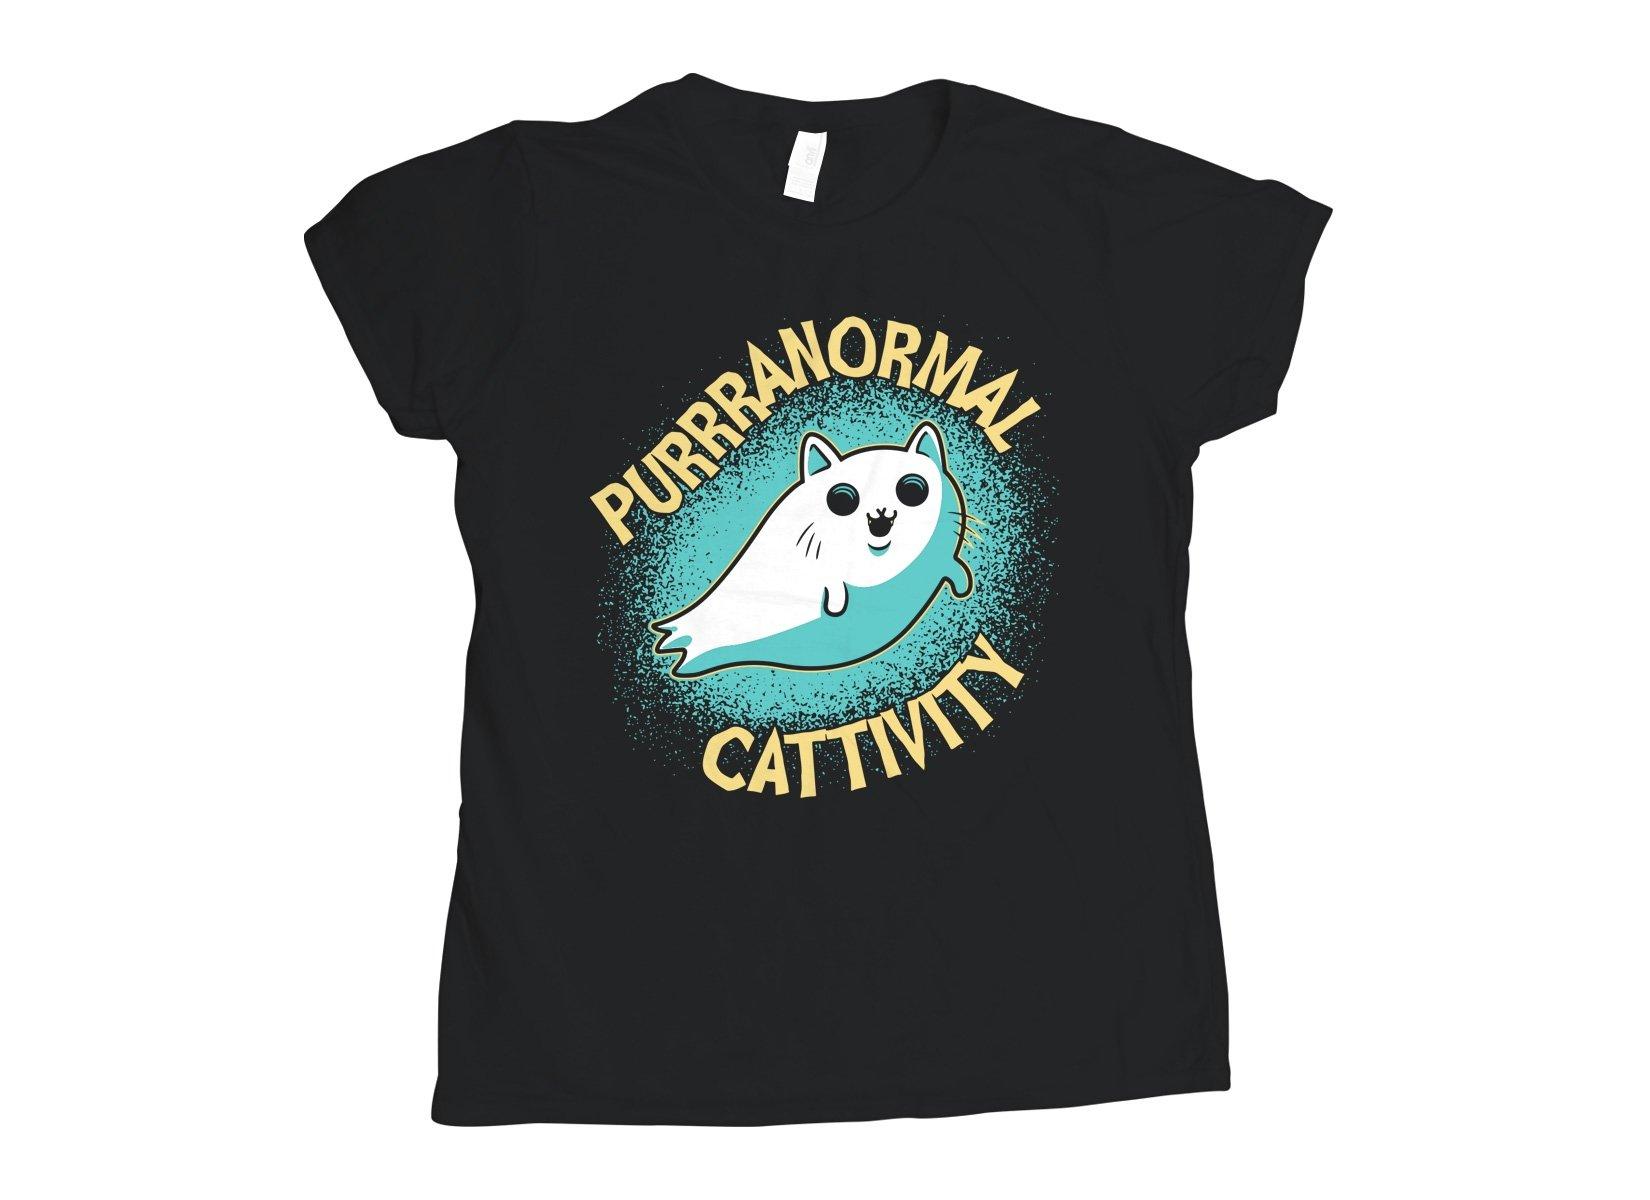 Purrranormal Cattivity on Womens T-Shirt